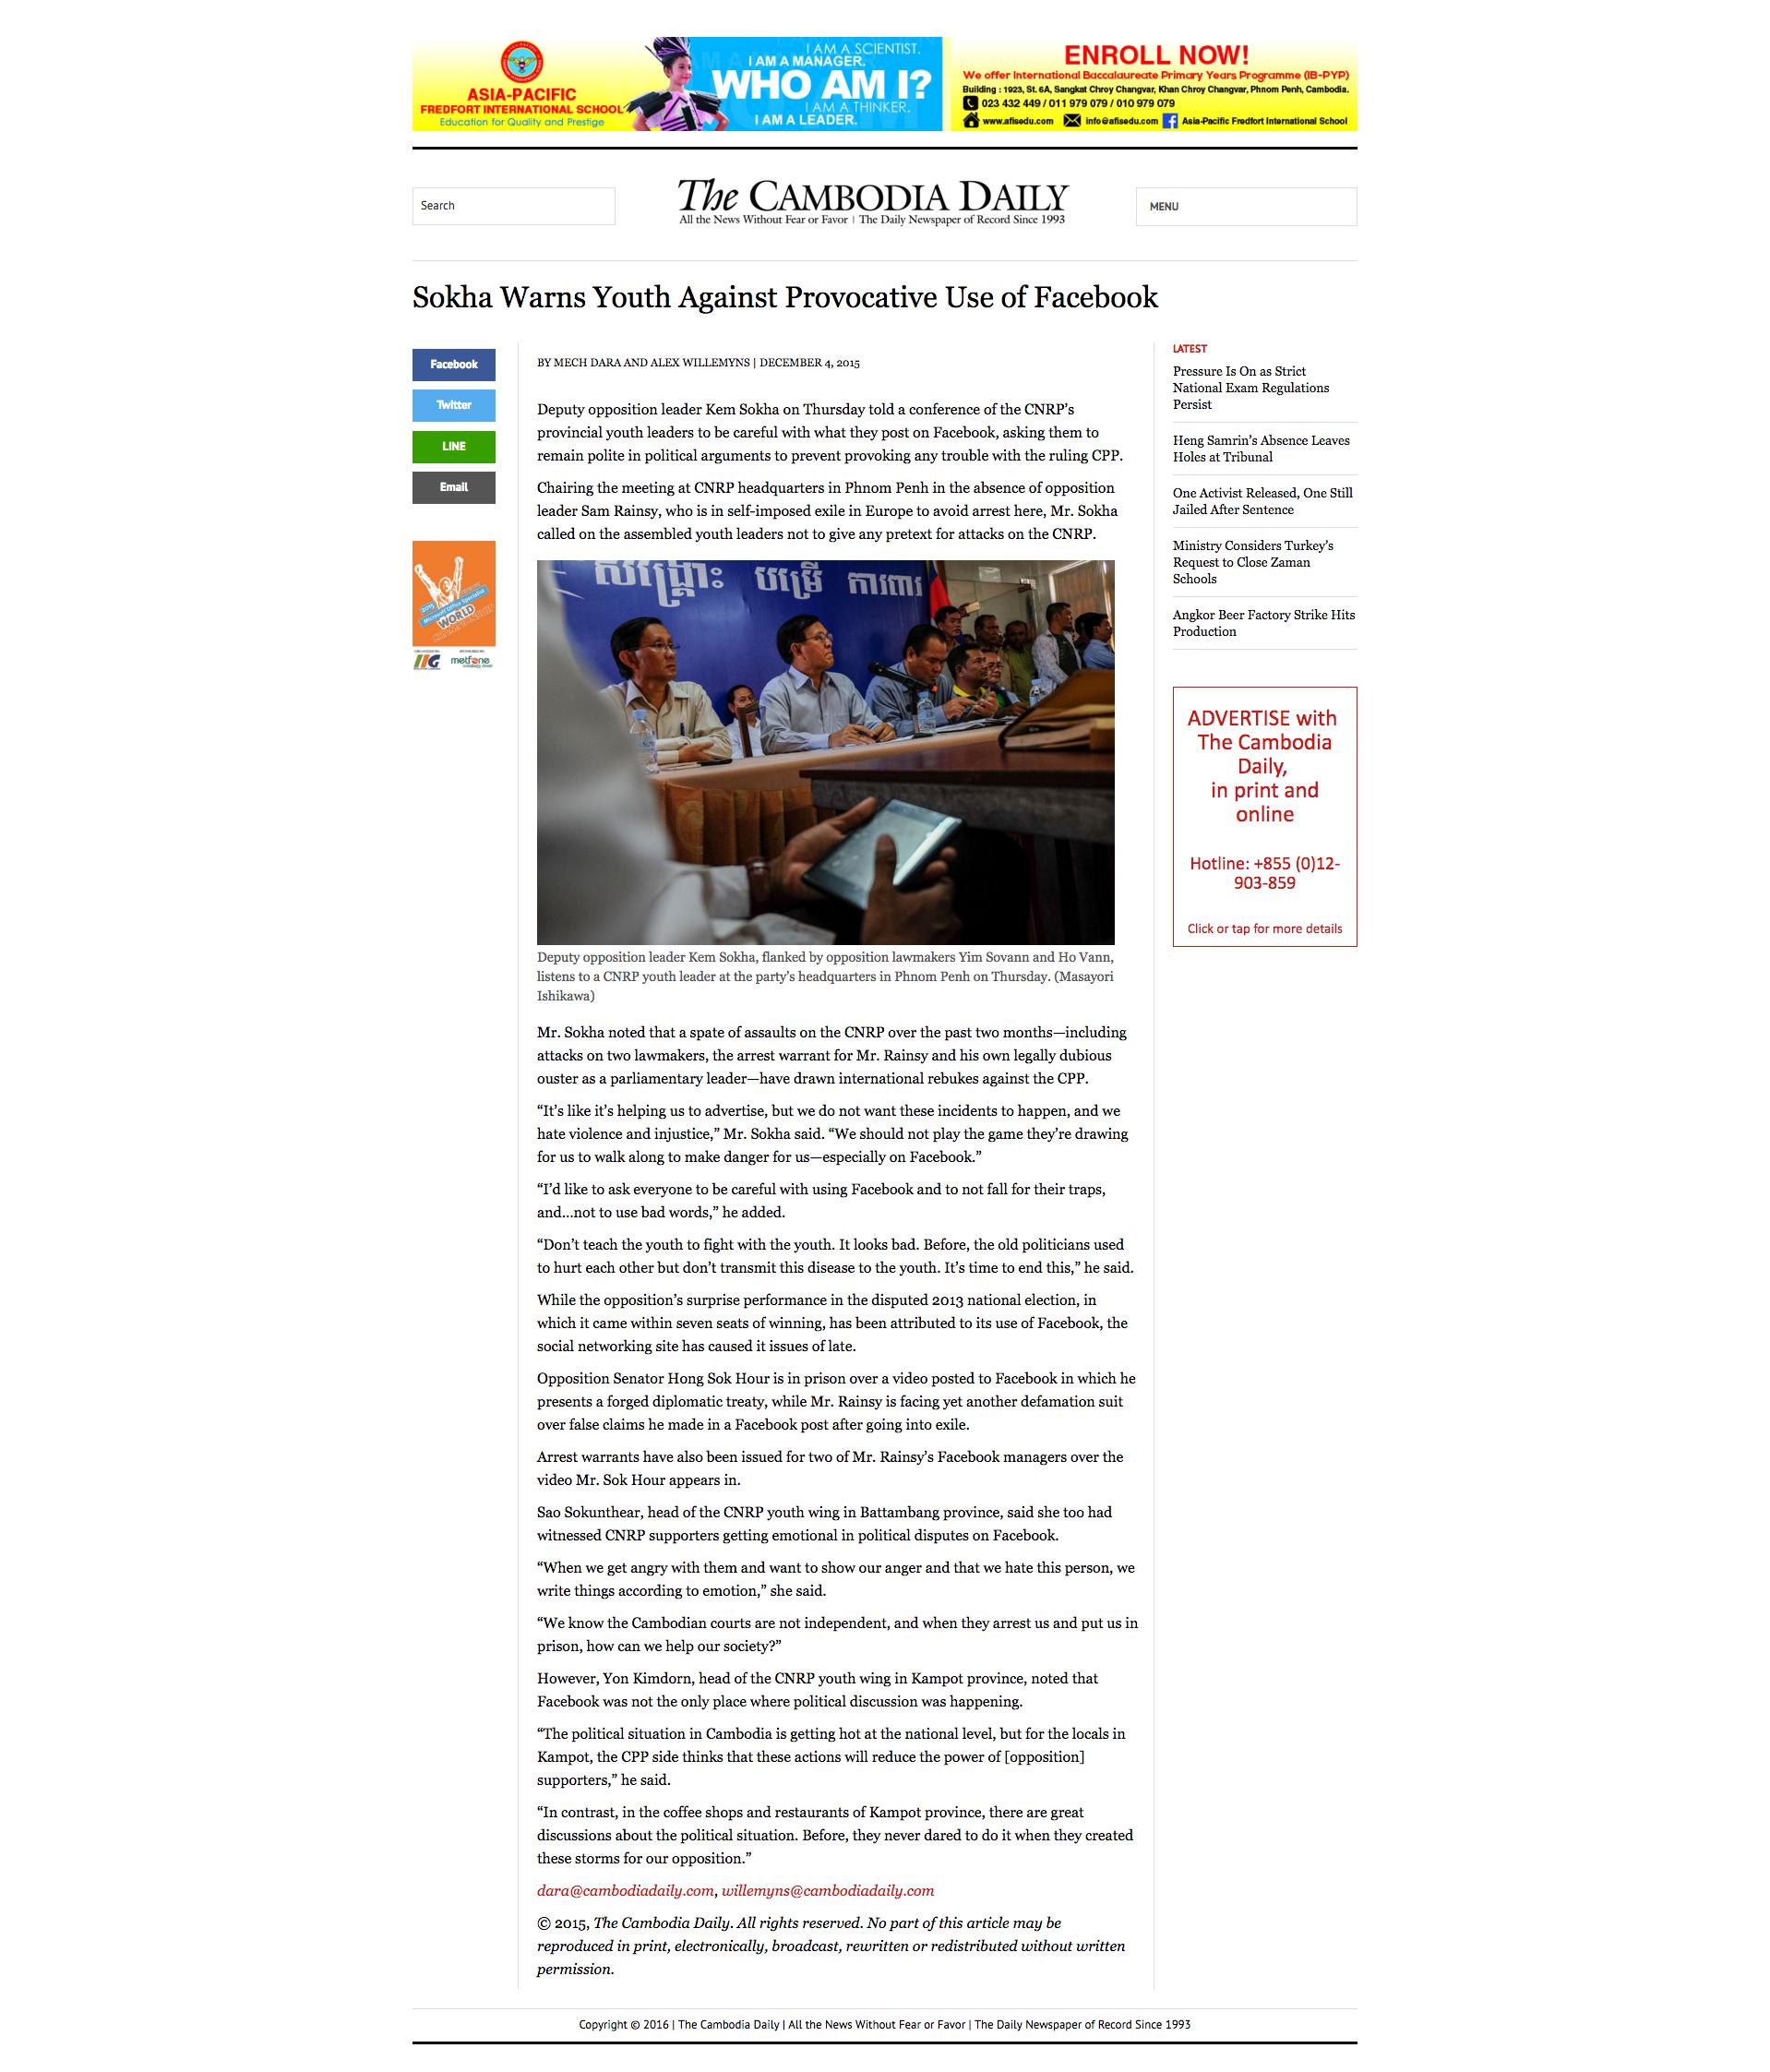 screencapture-cambodiadaily-news-sokha-warns-youth-against-provocative-use-of-facebook-102004-147197